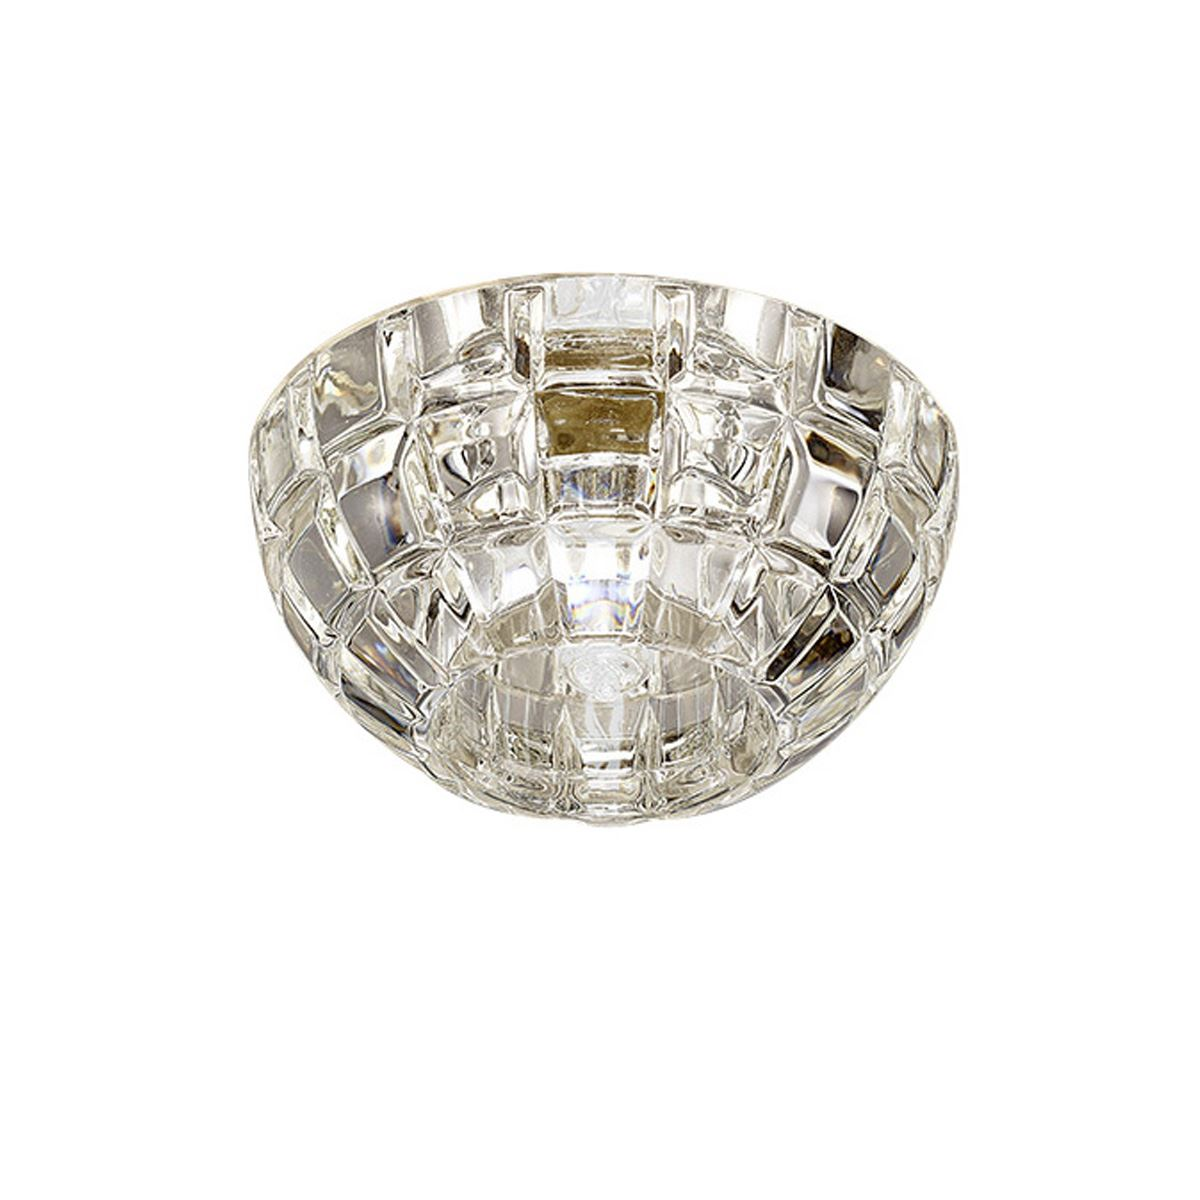 Diyas IL31840CH Ria G9 Dome Downlight Polished Chrome/Crystal